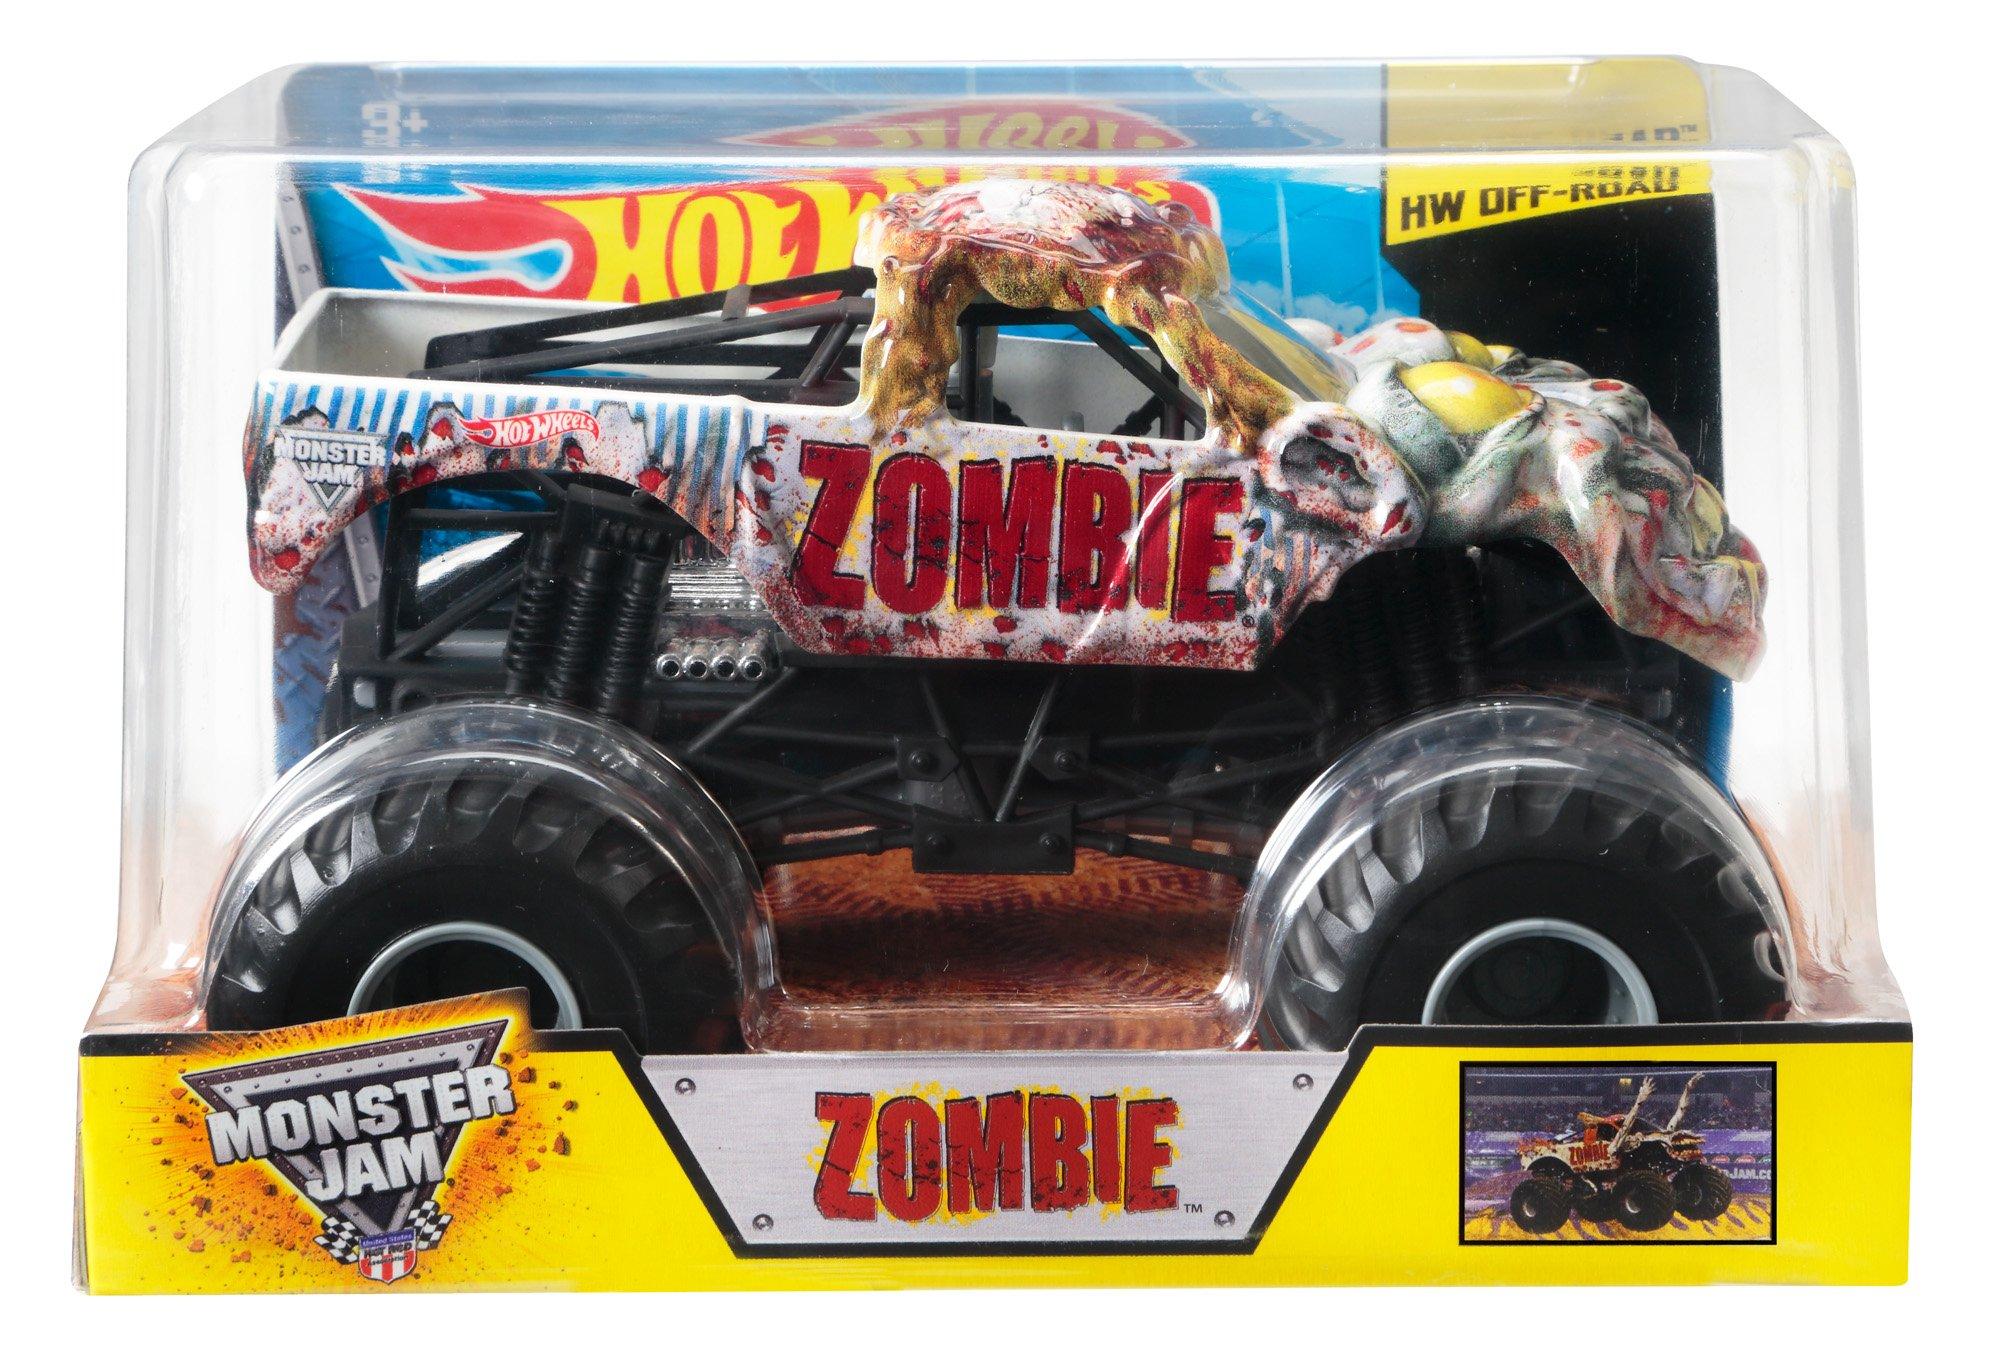 Hot Wheels Monster Jam Zombie Die Cast Vehicle 1 24 Scale Toys